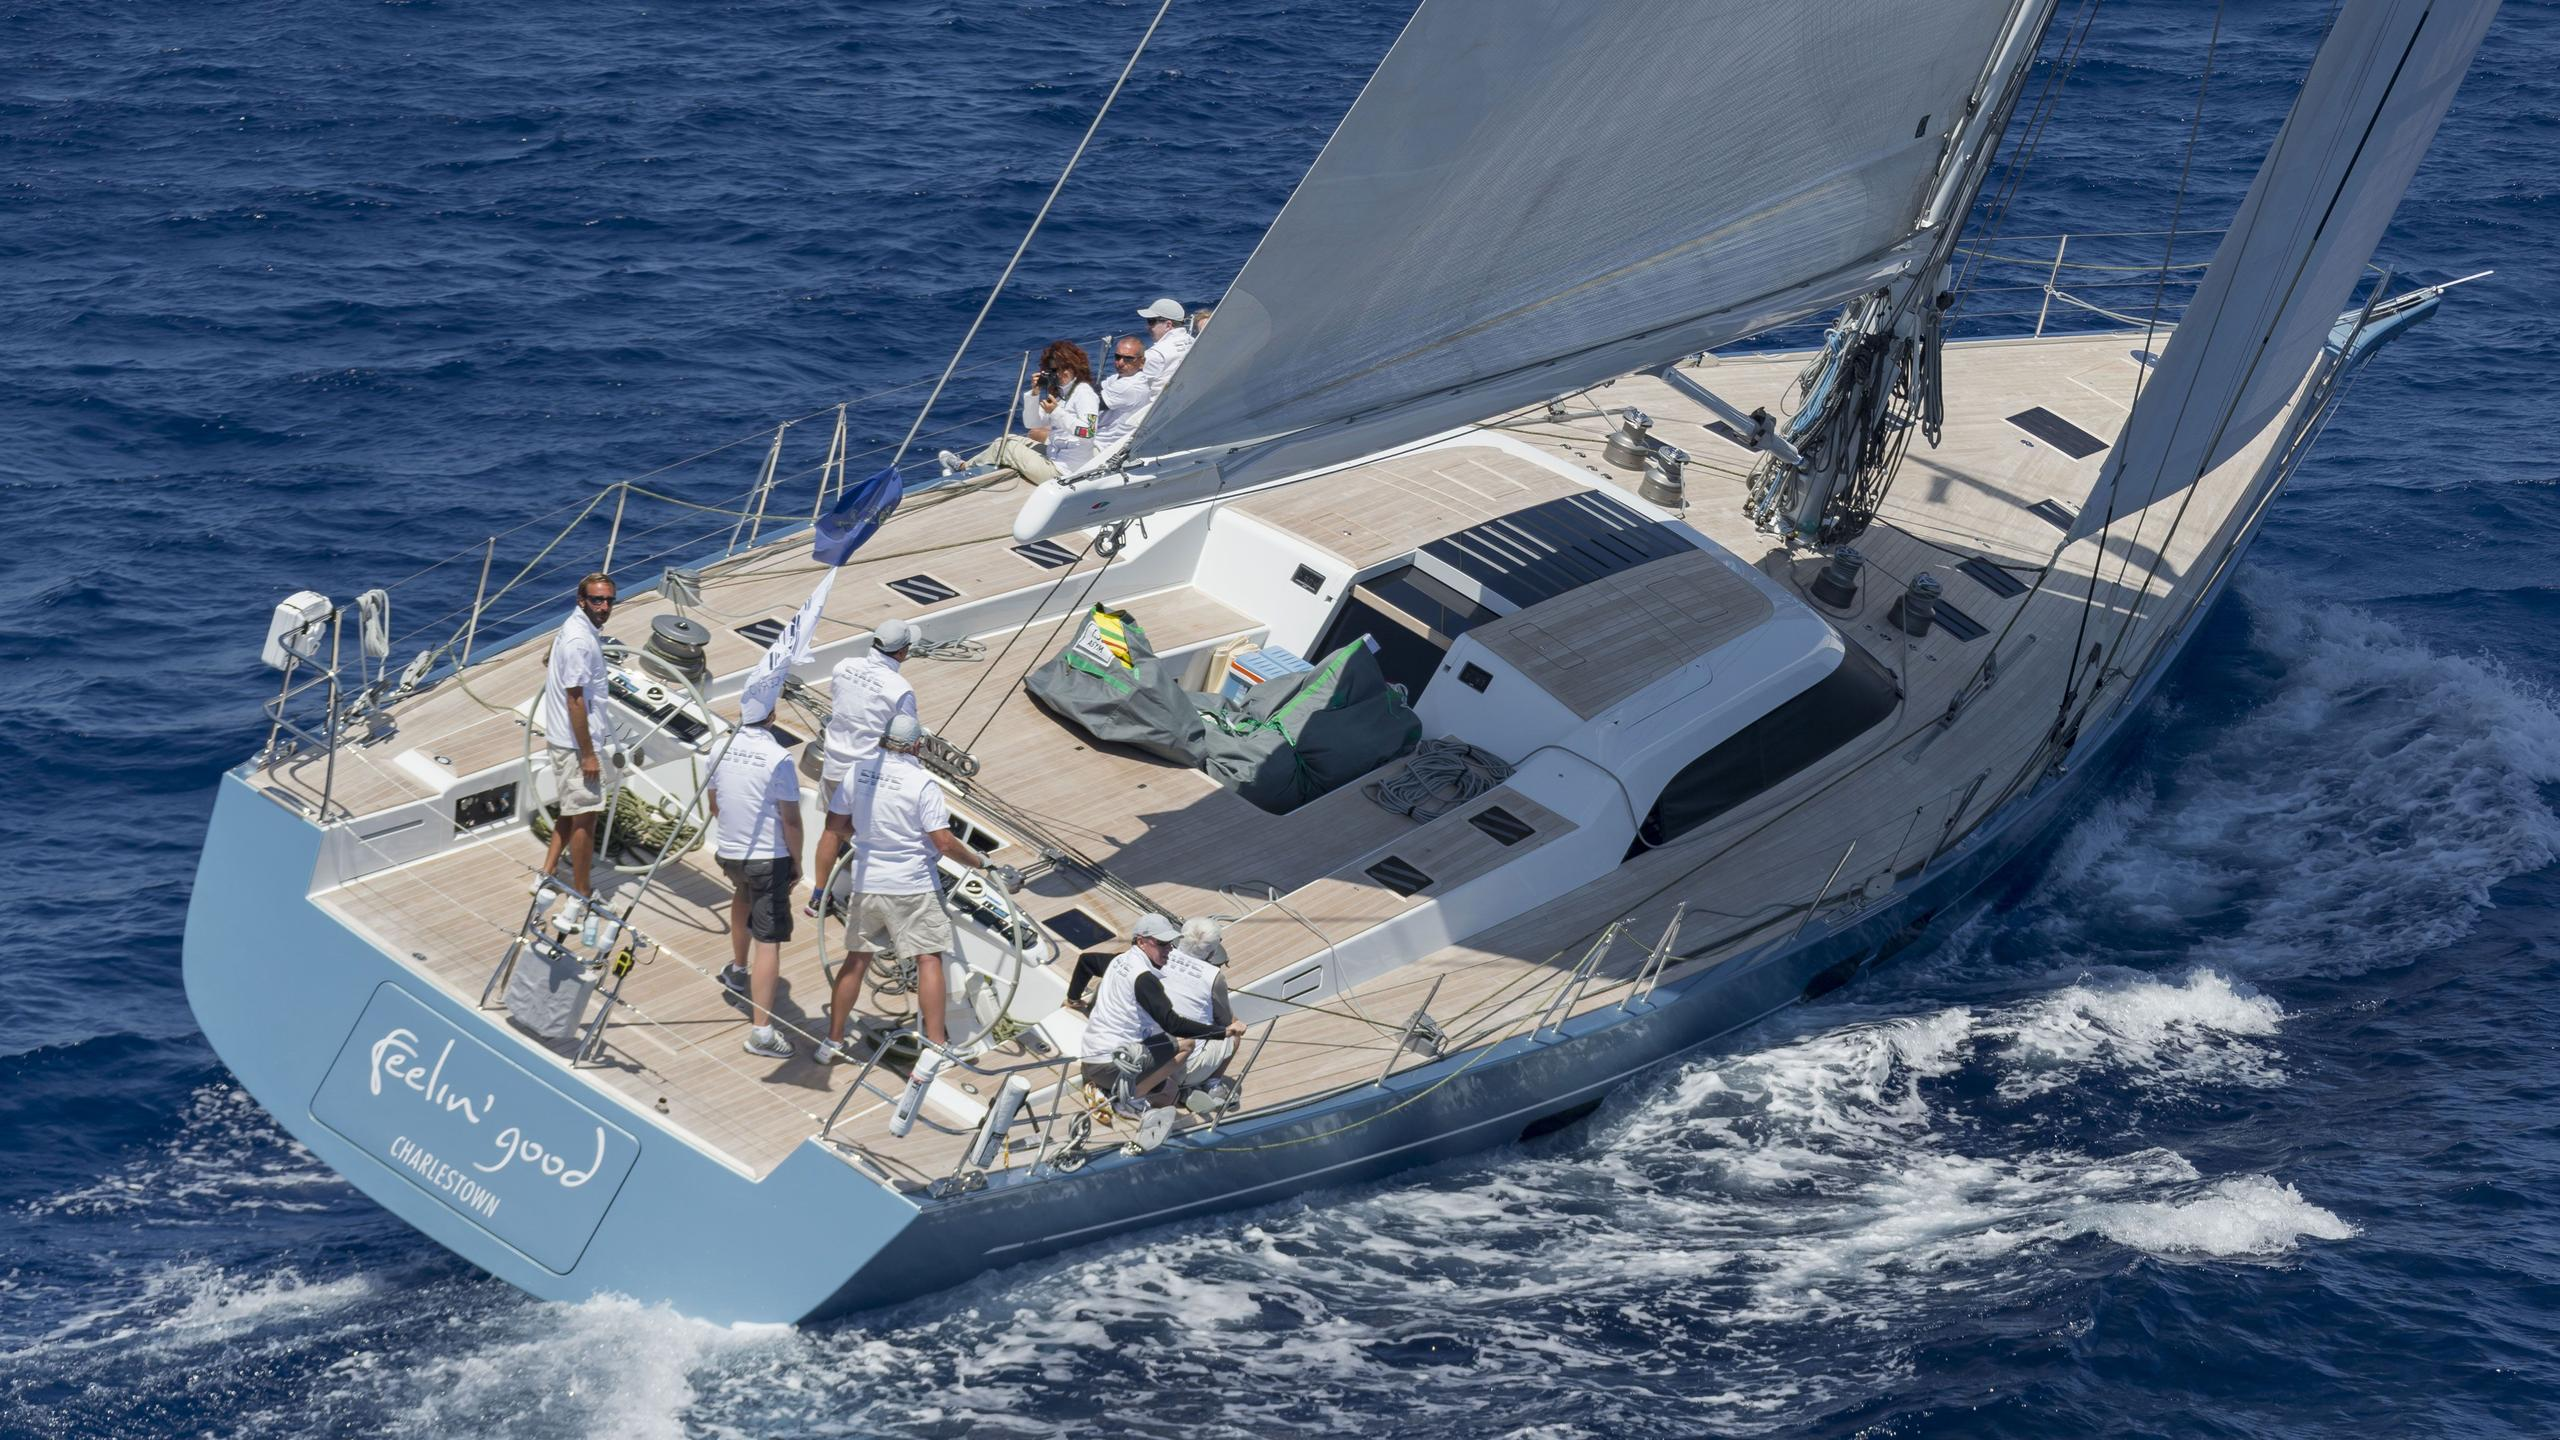 Feelin good sailing yacht running aft